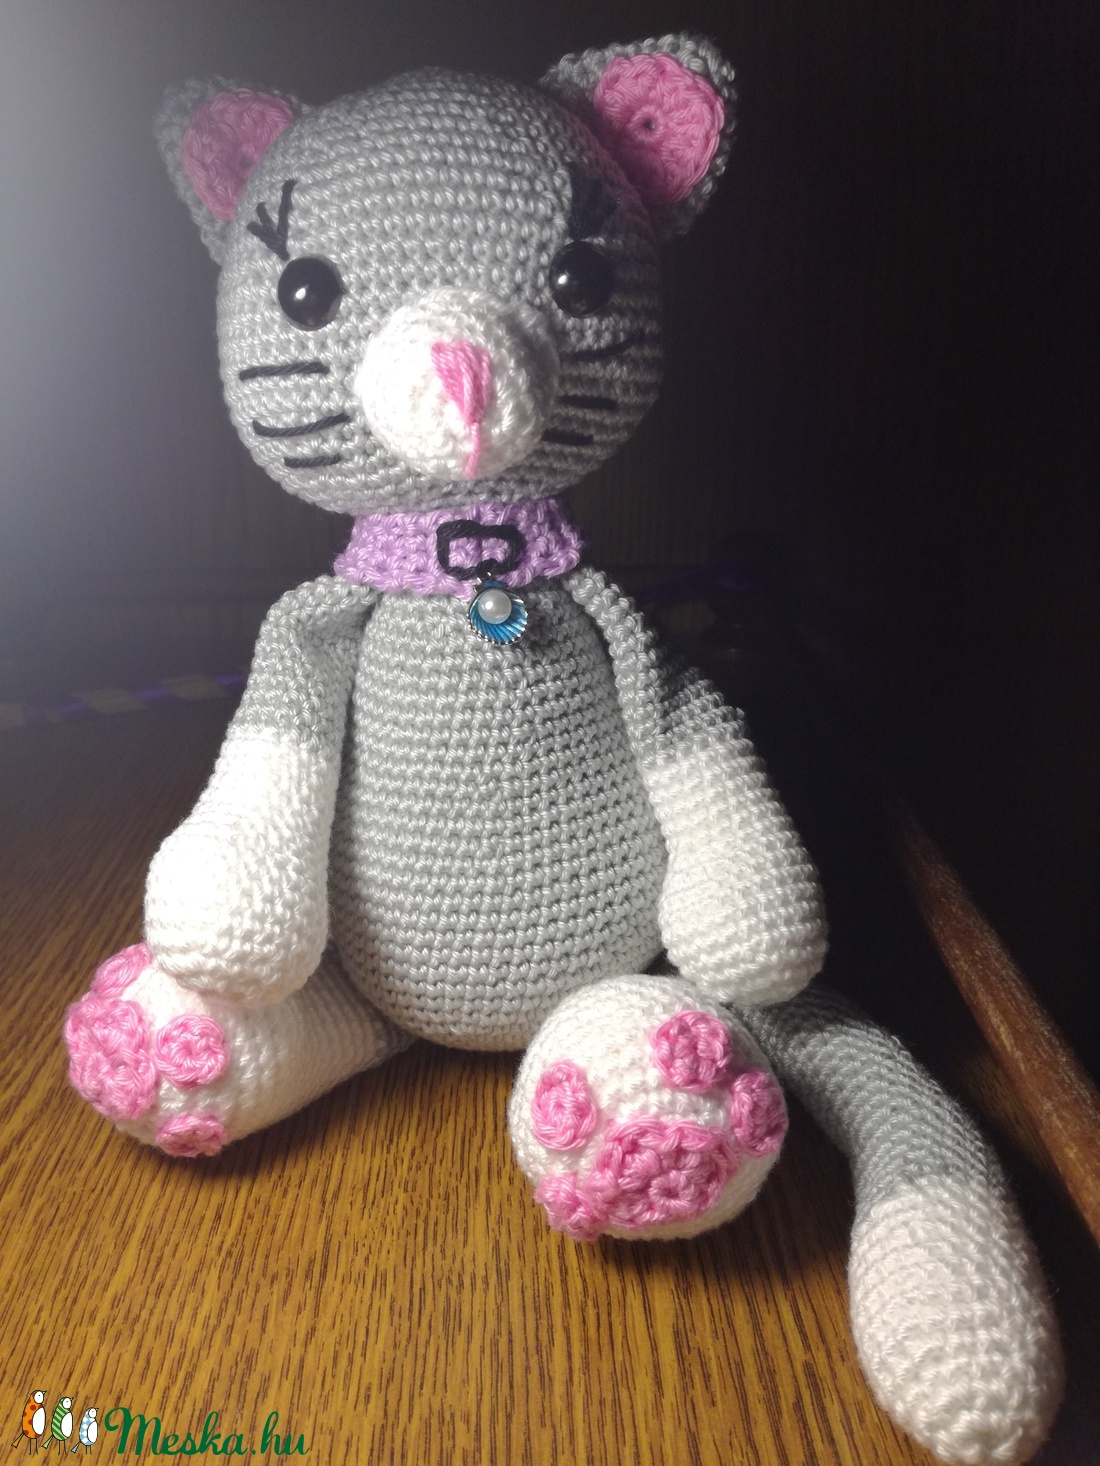 Szürke cica (kityom) - Meska.hu